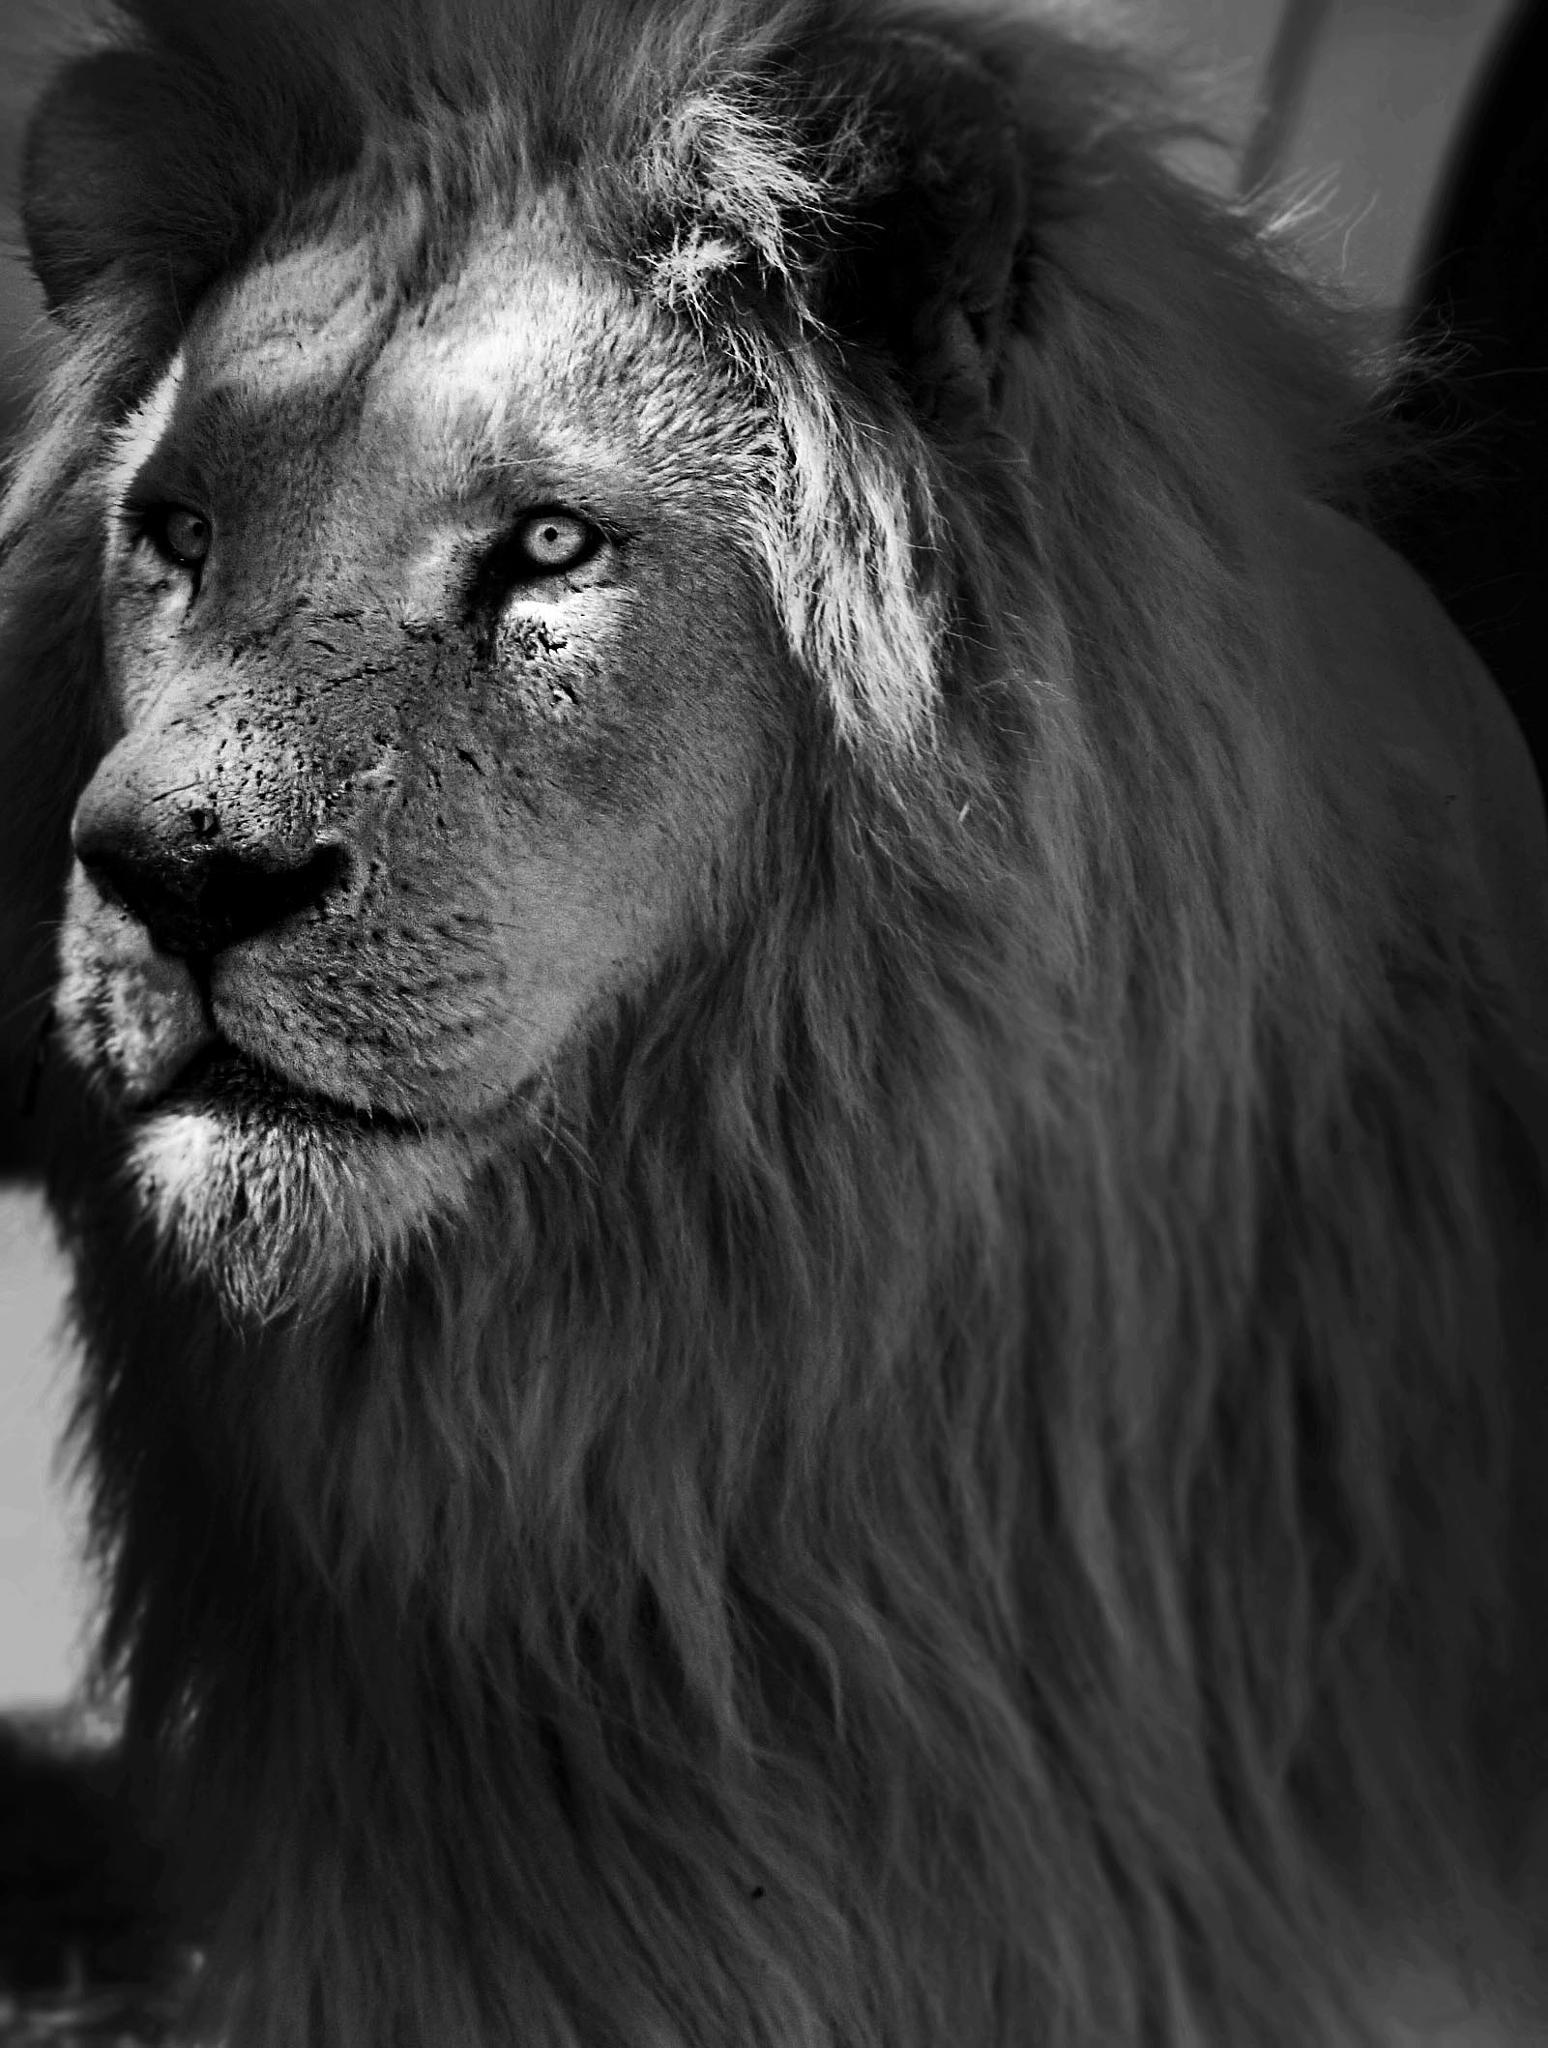 Lion by AnSophia